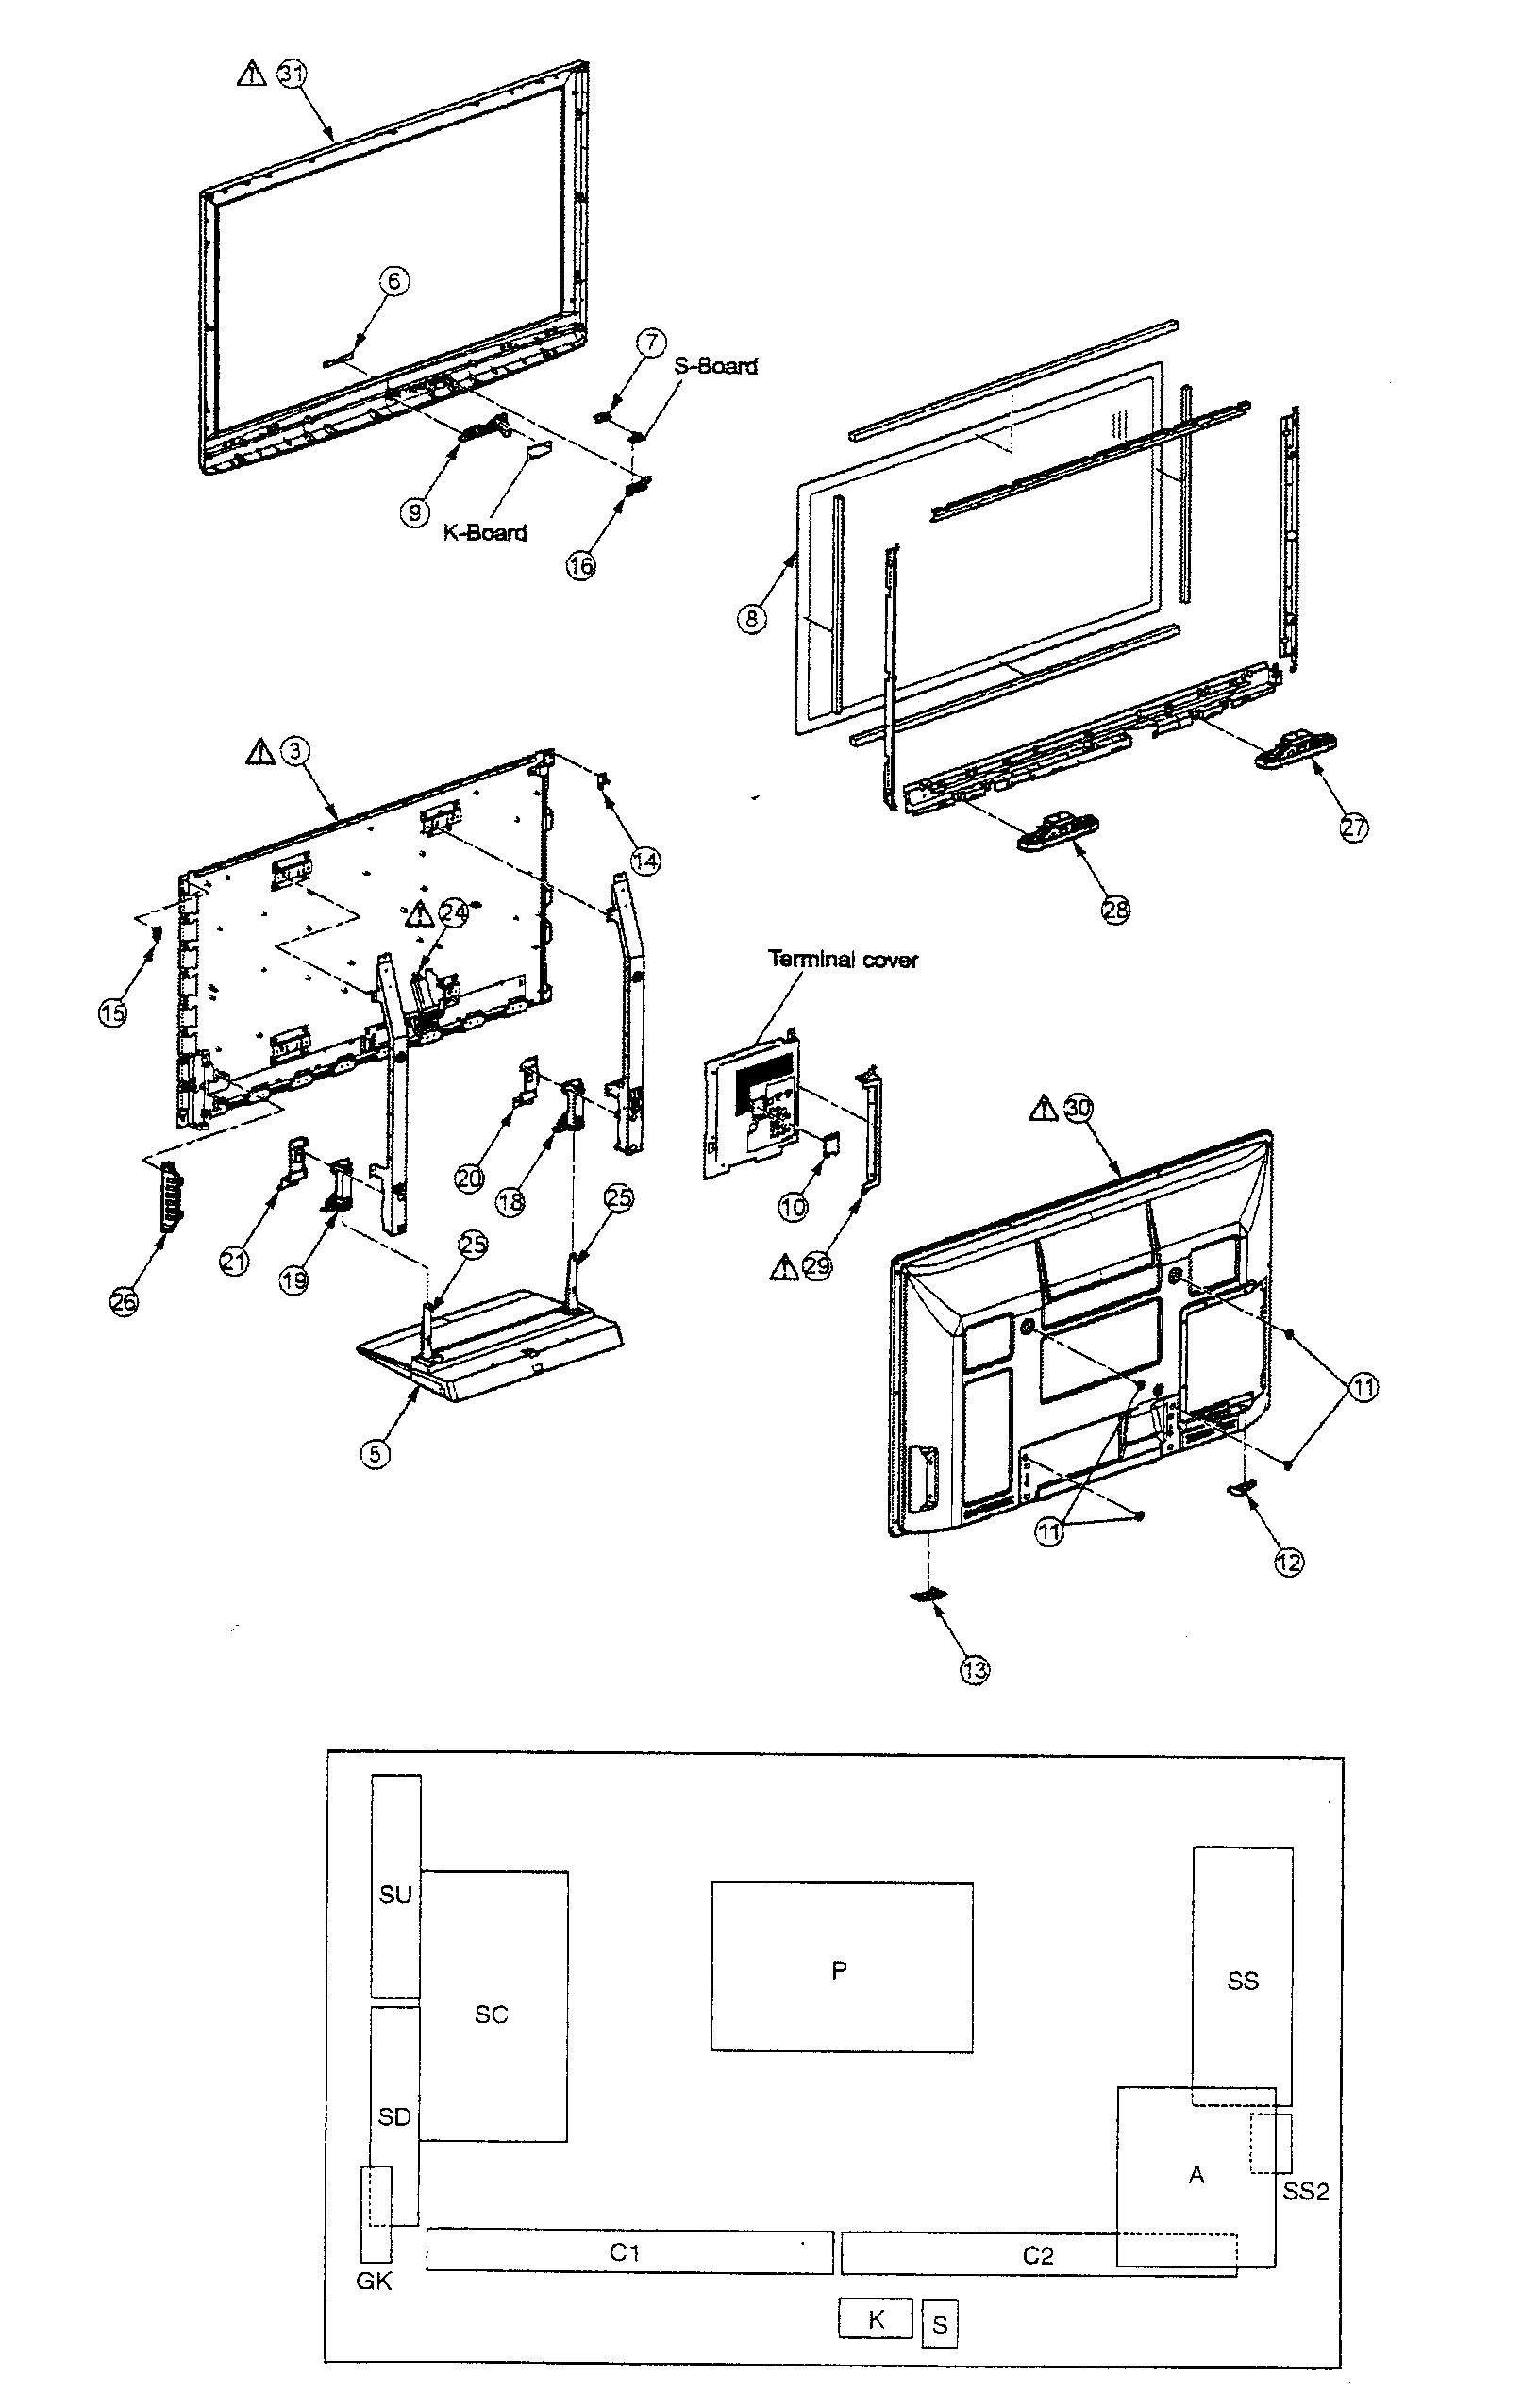 Panasonic model TC-P42X1 plasma television genuine parts